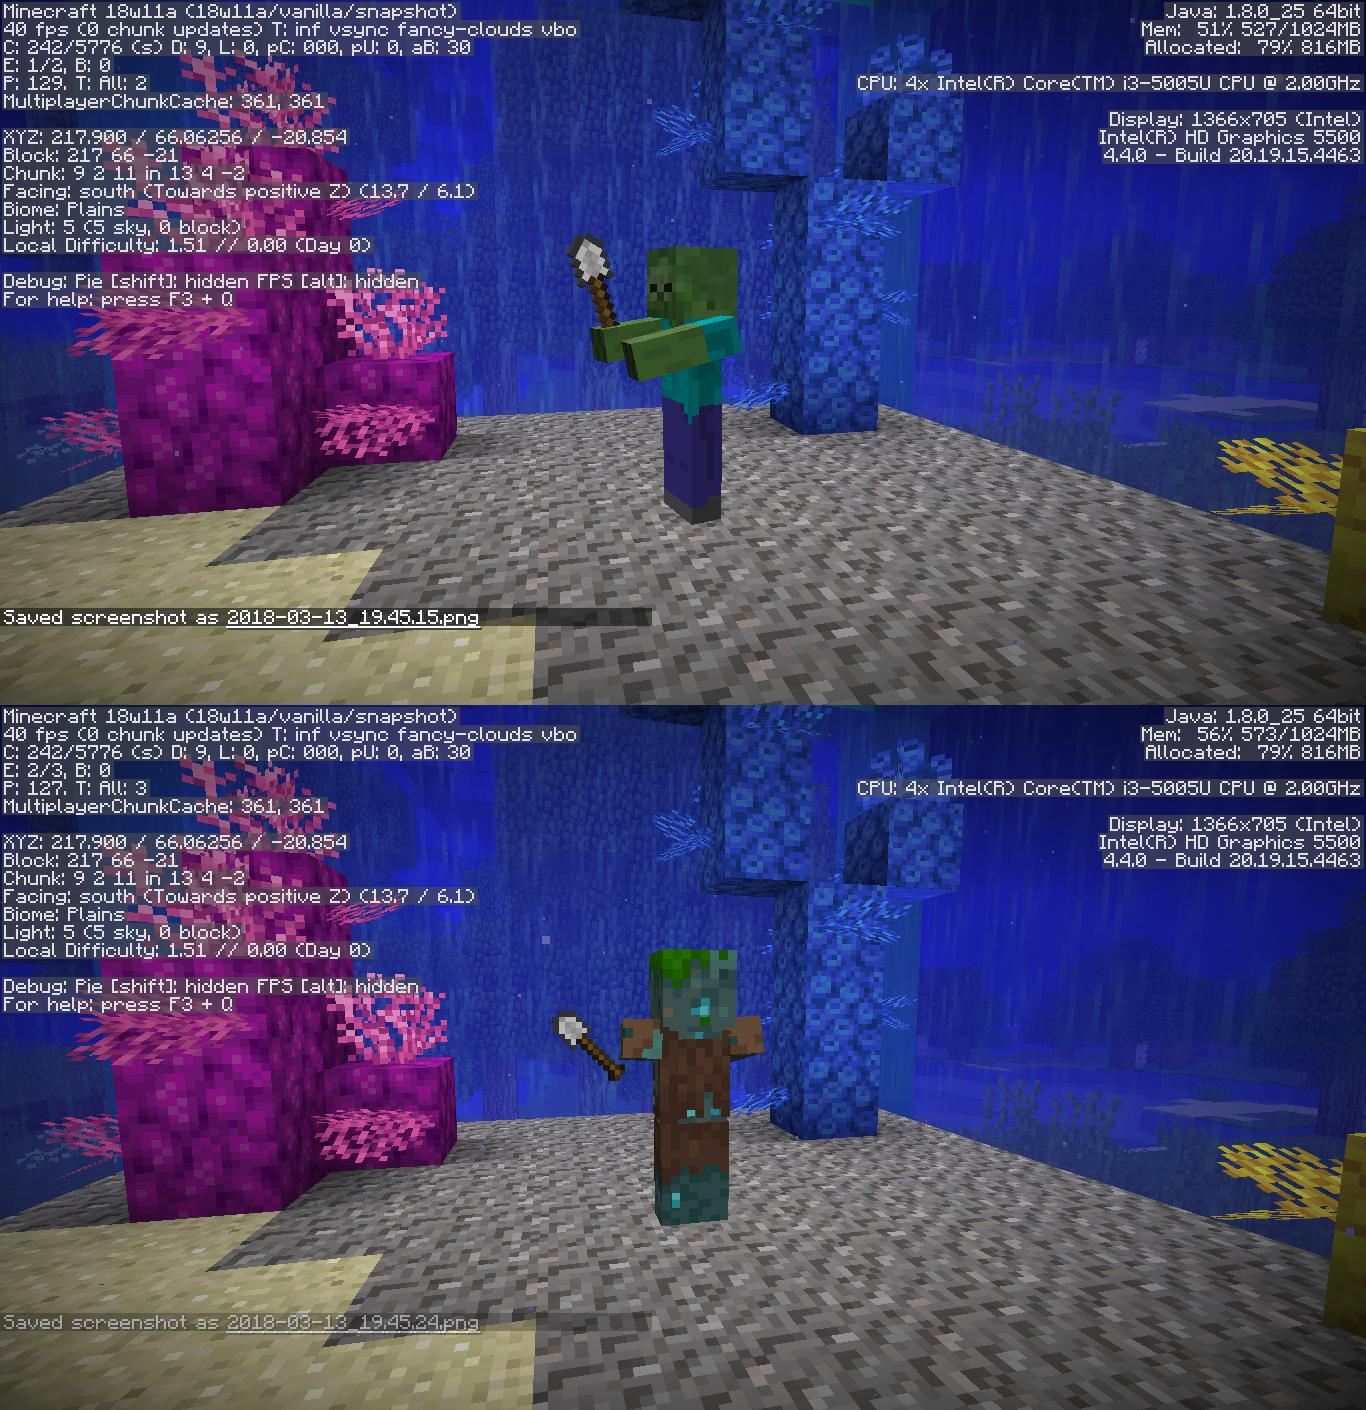 MC-127291] Zombies drowning always drop armor items instead